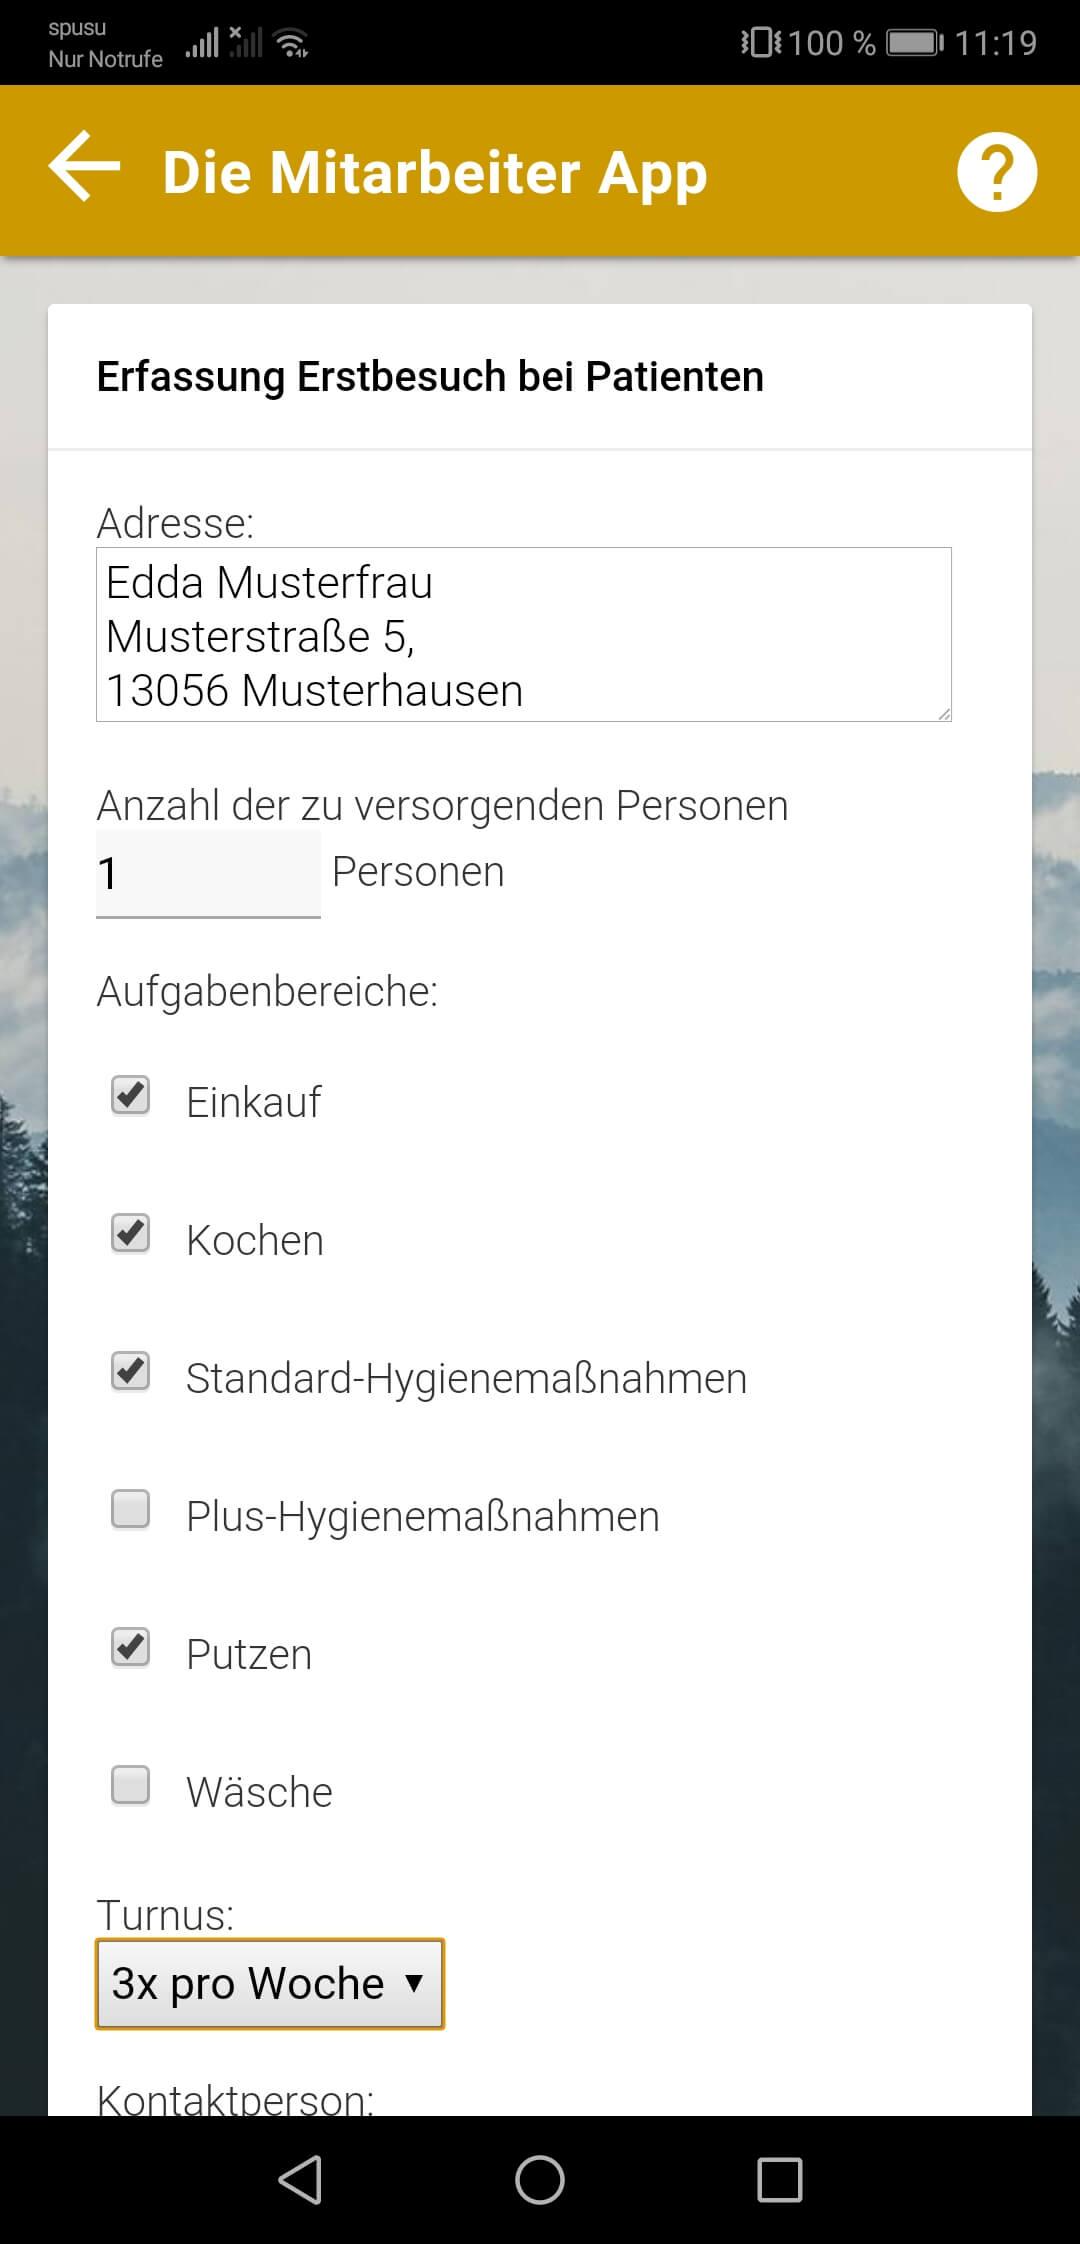 Eigenes_Formular_appdialog_Mitarbeiter_App